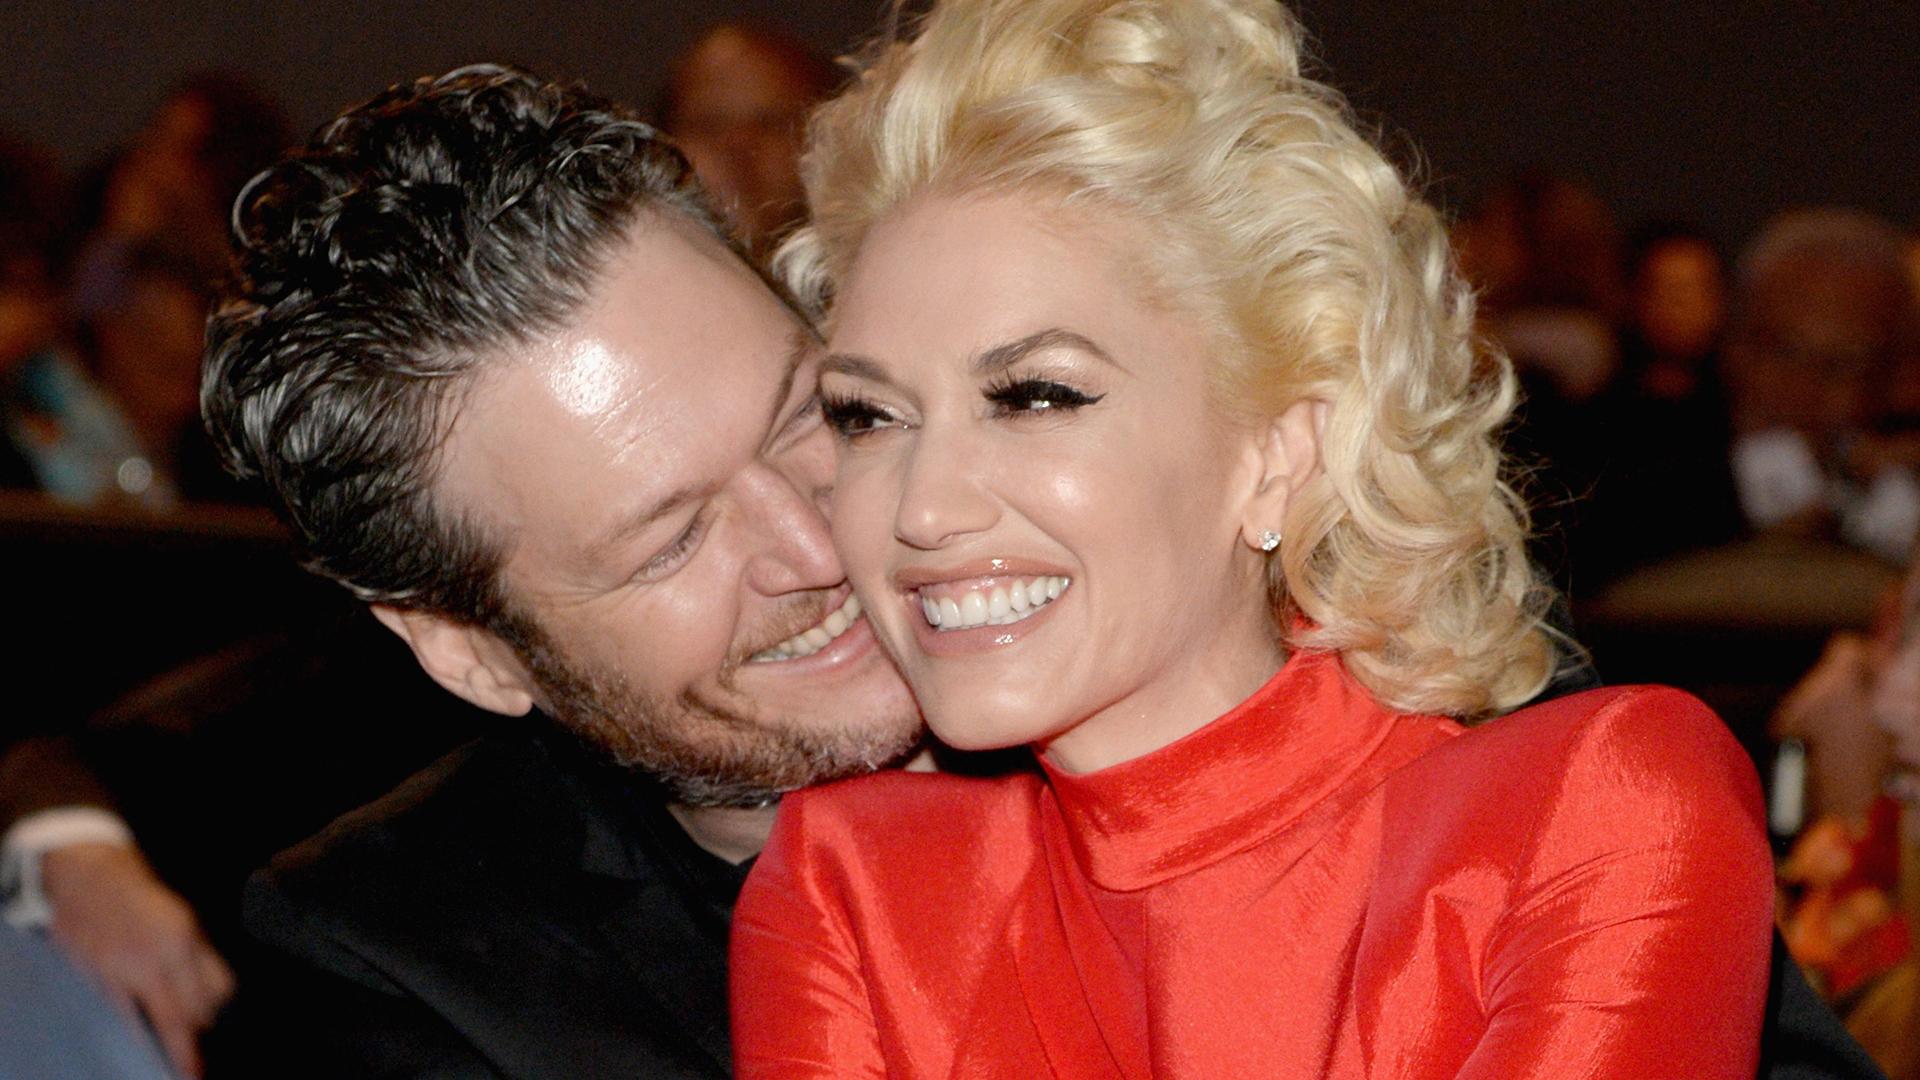 Gwen Stefani Shows Her Love for Blake Shelton